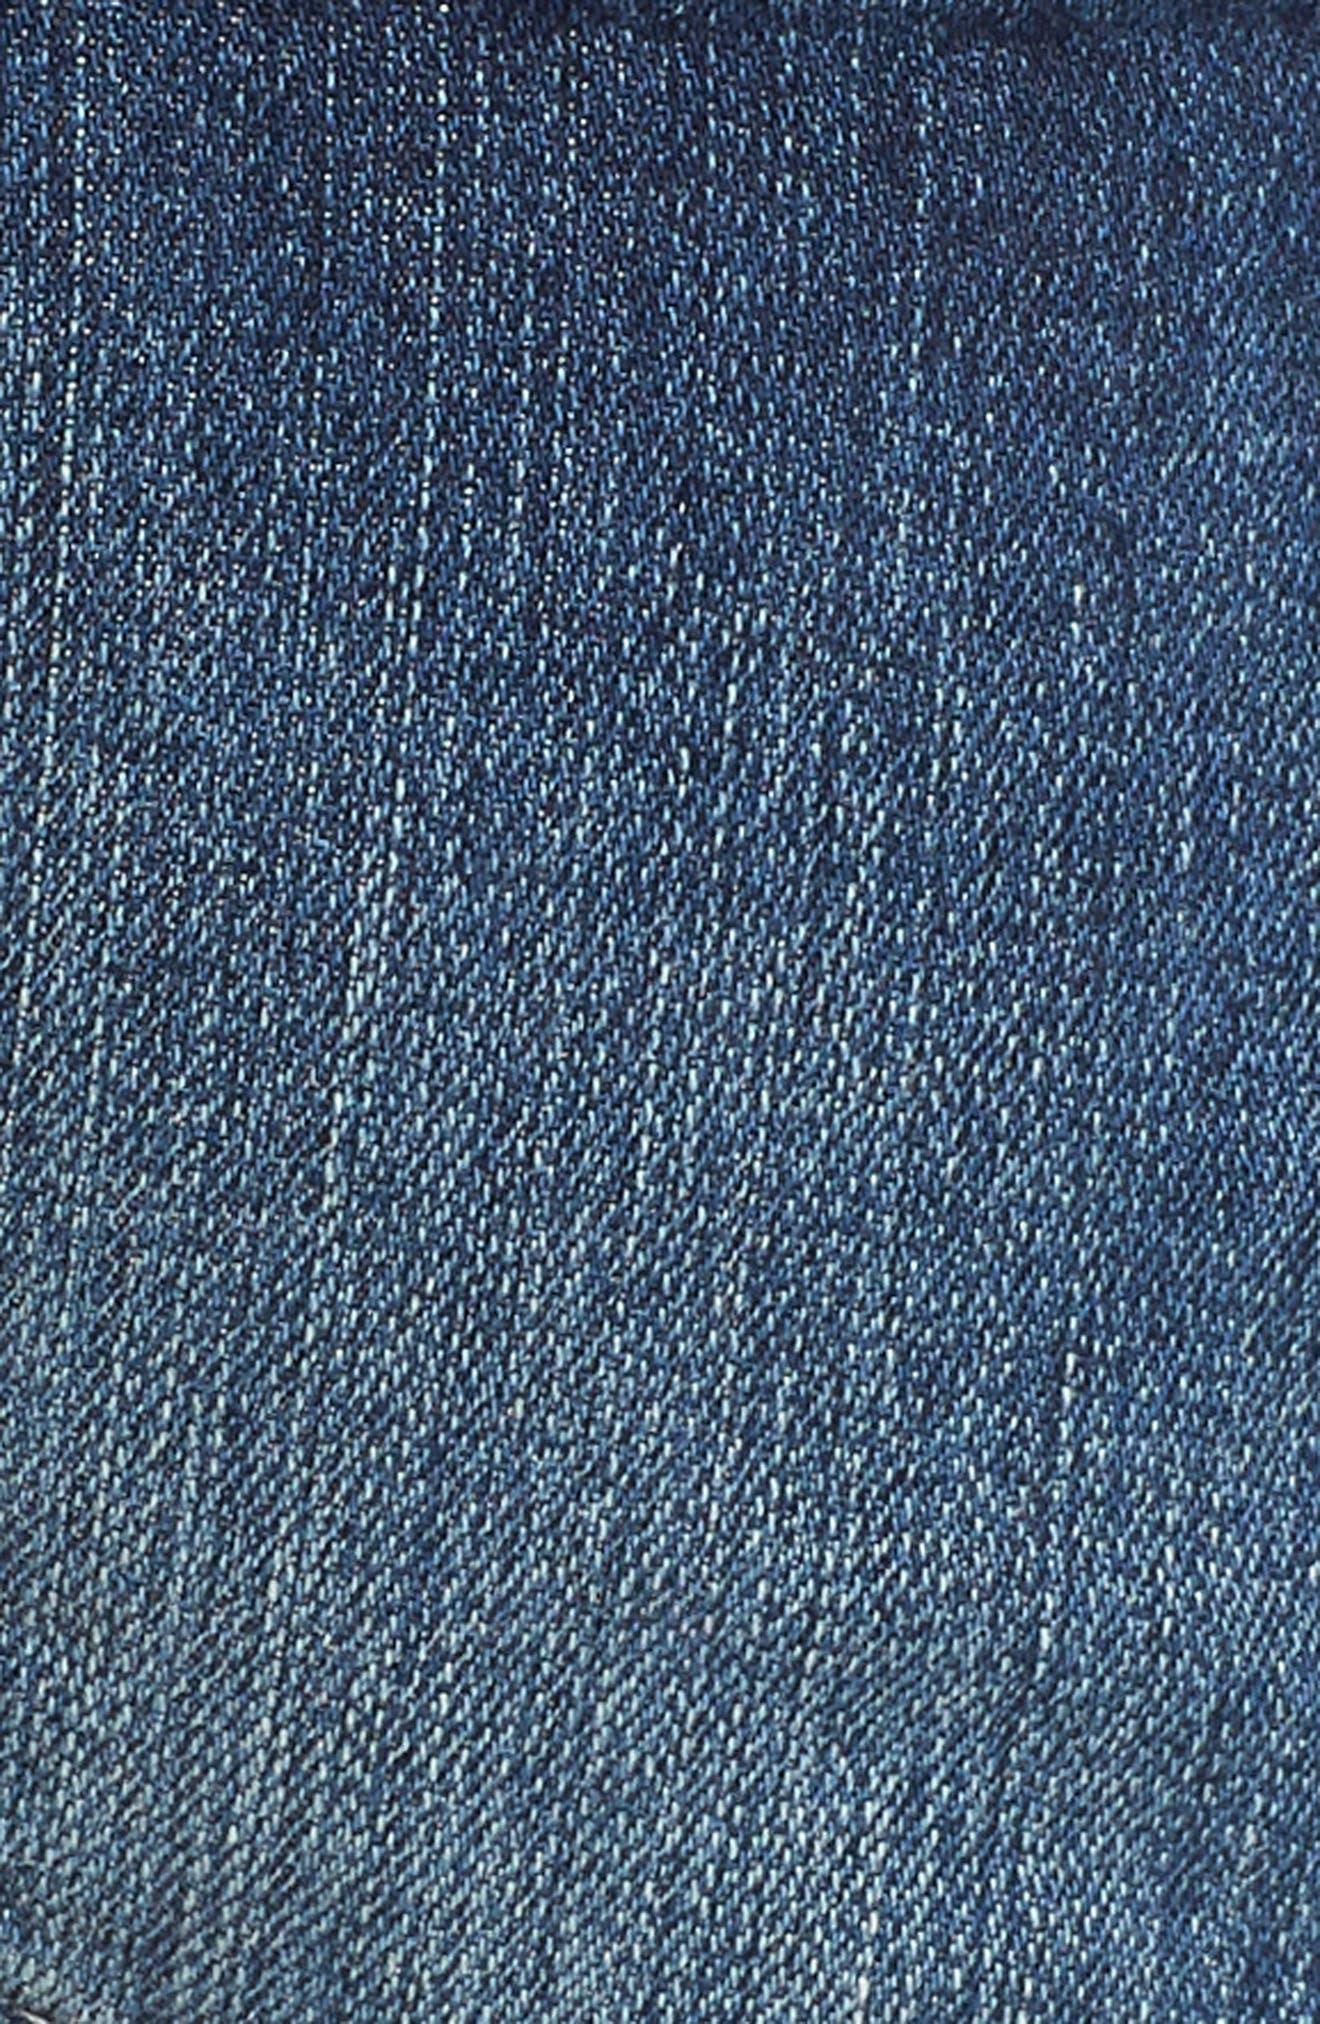 Tellis Slim Fit Jeans,                             Alternate thumbnail 5, color,                             12 YEARS MAVERICKS